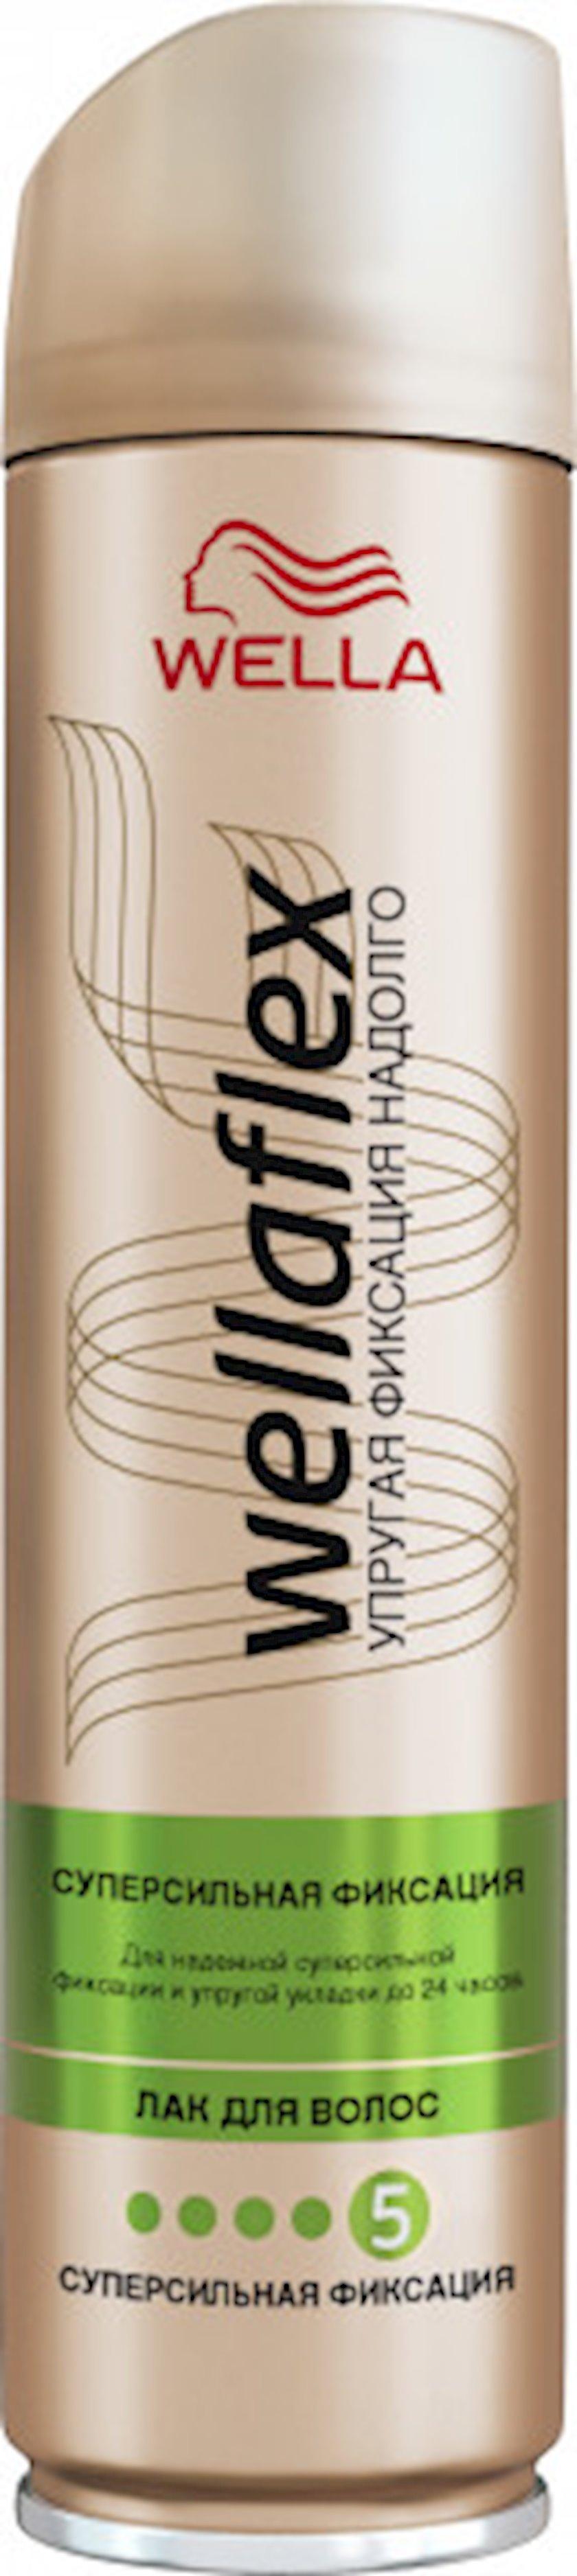 Saç lakı Wella Wellaflex Supergüclü Fiksasiya 250 ml